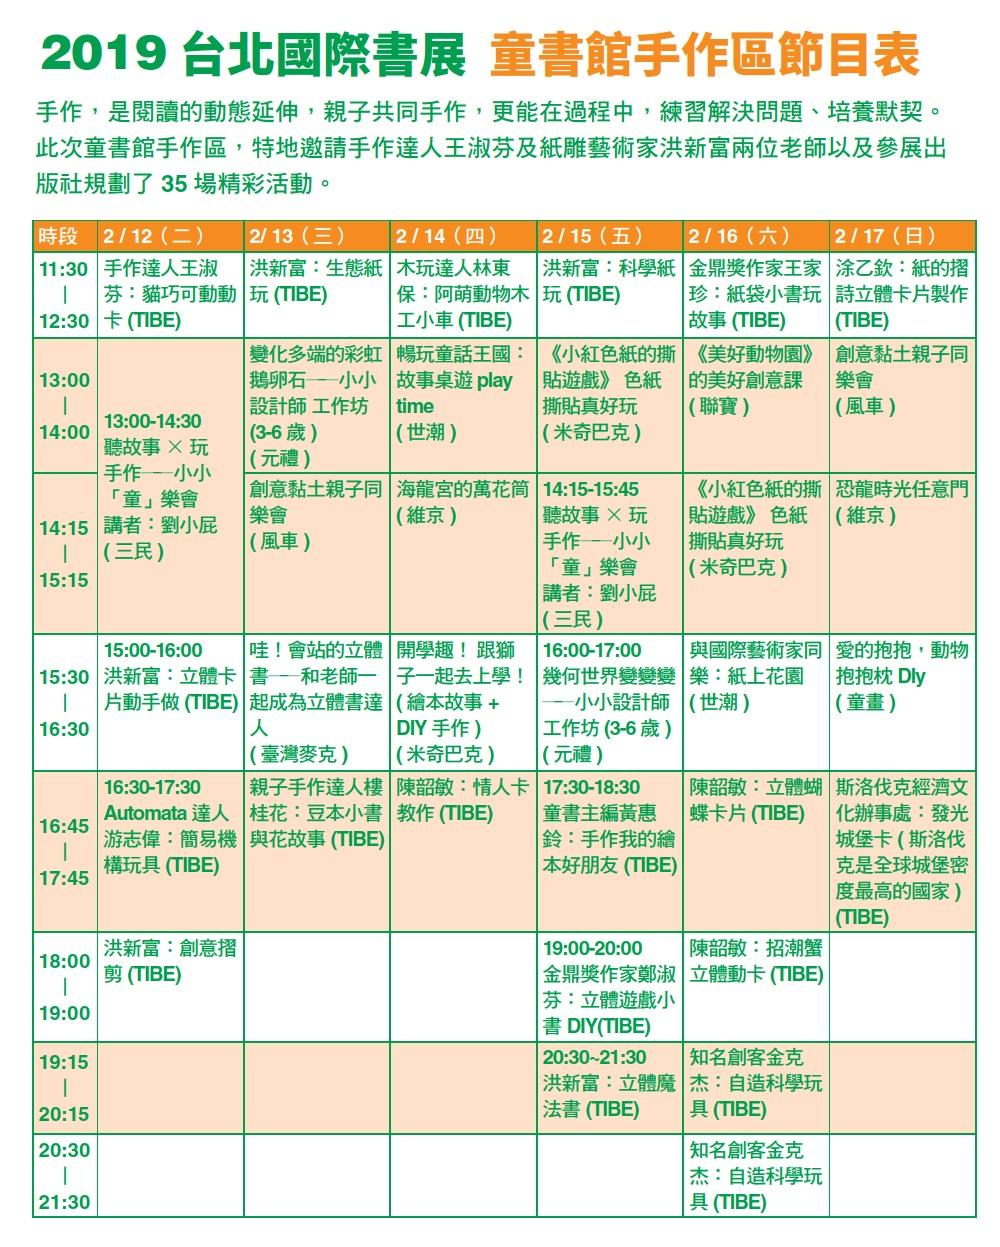 2019TIBE【三館童書館手作區】節目表